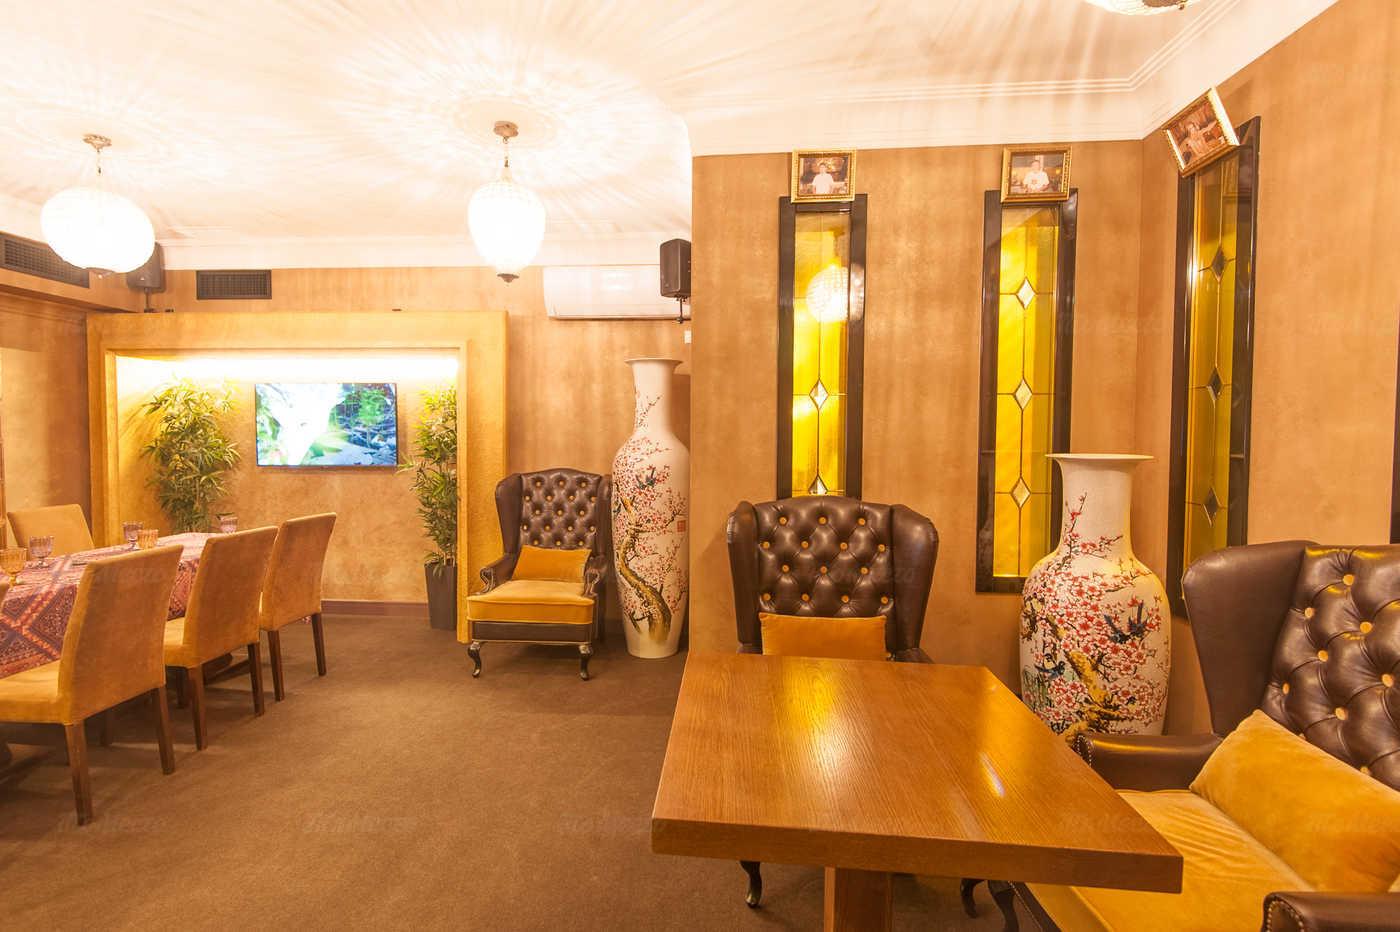 Ресторан Кафедра Вкуса на Ломоносовском проспекте фото 6